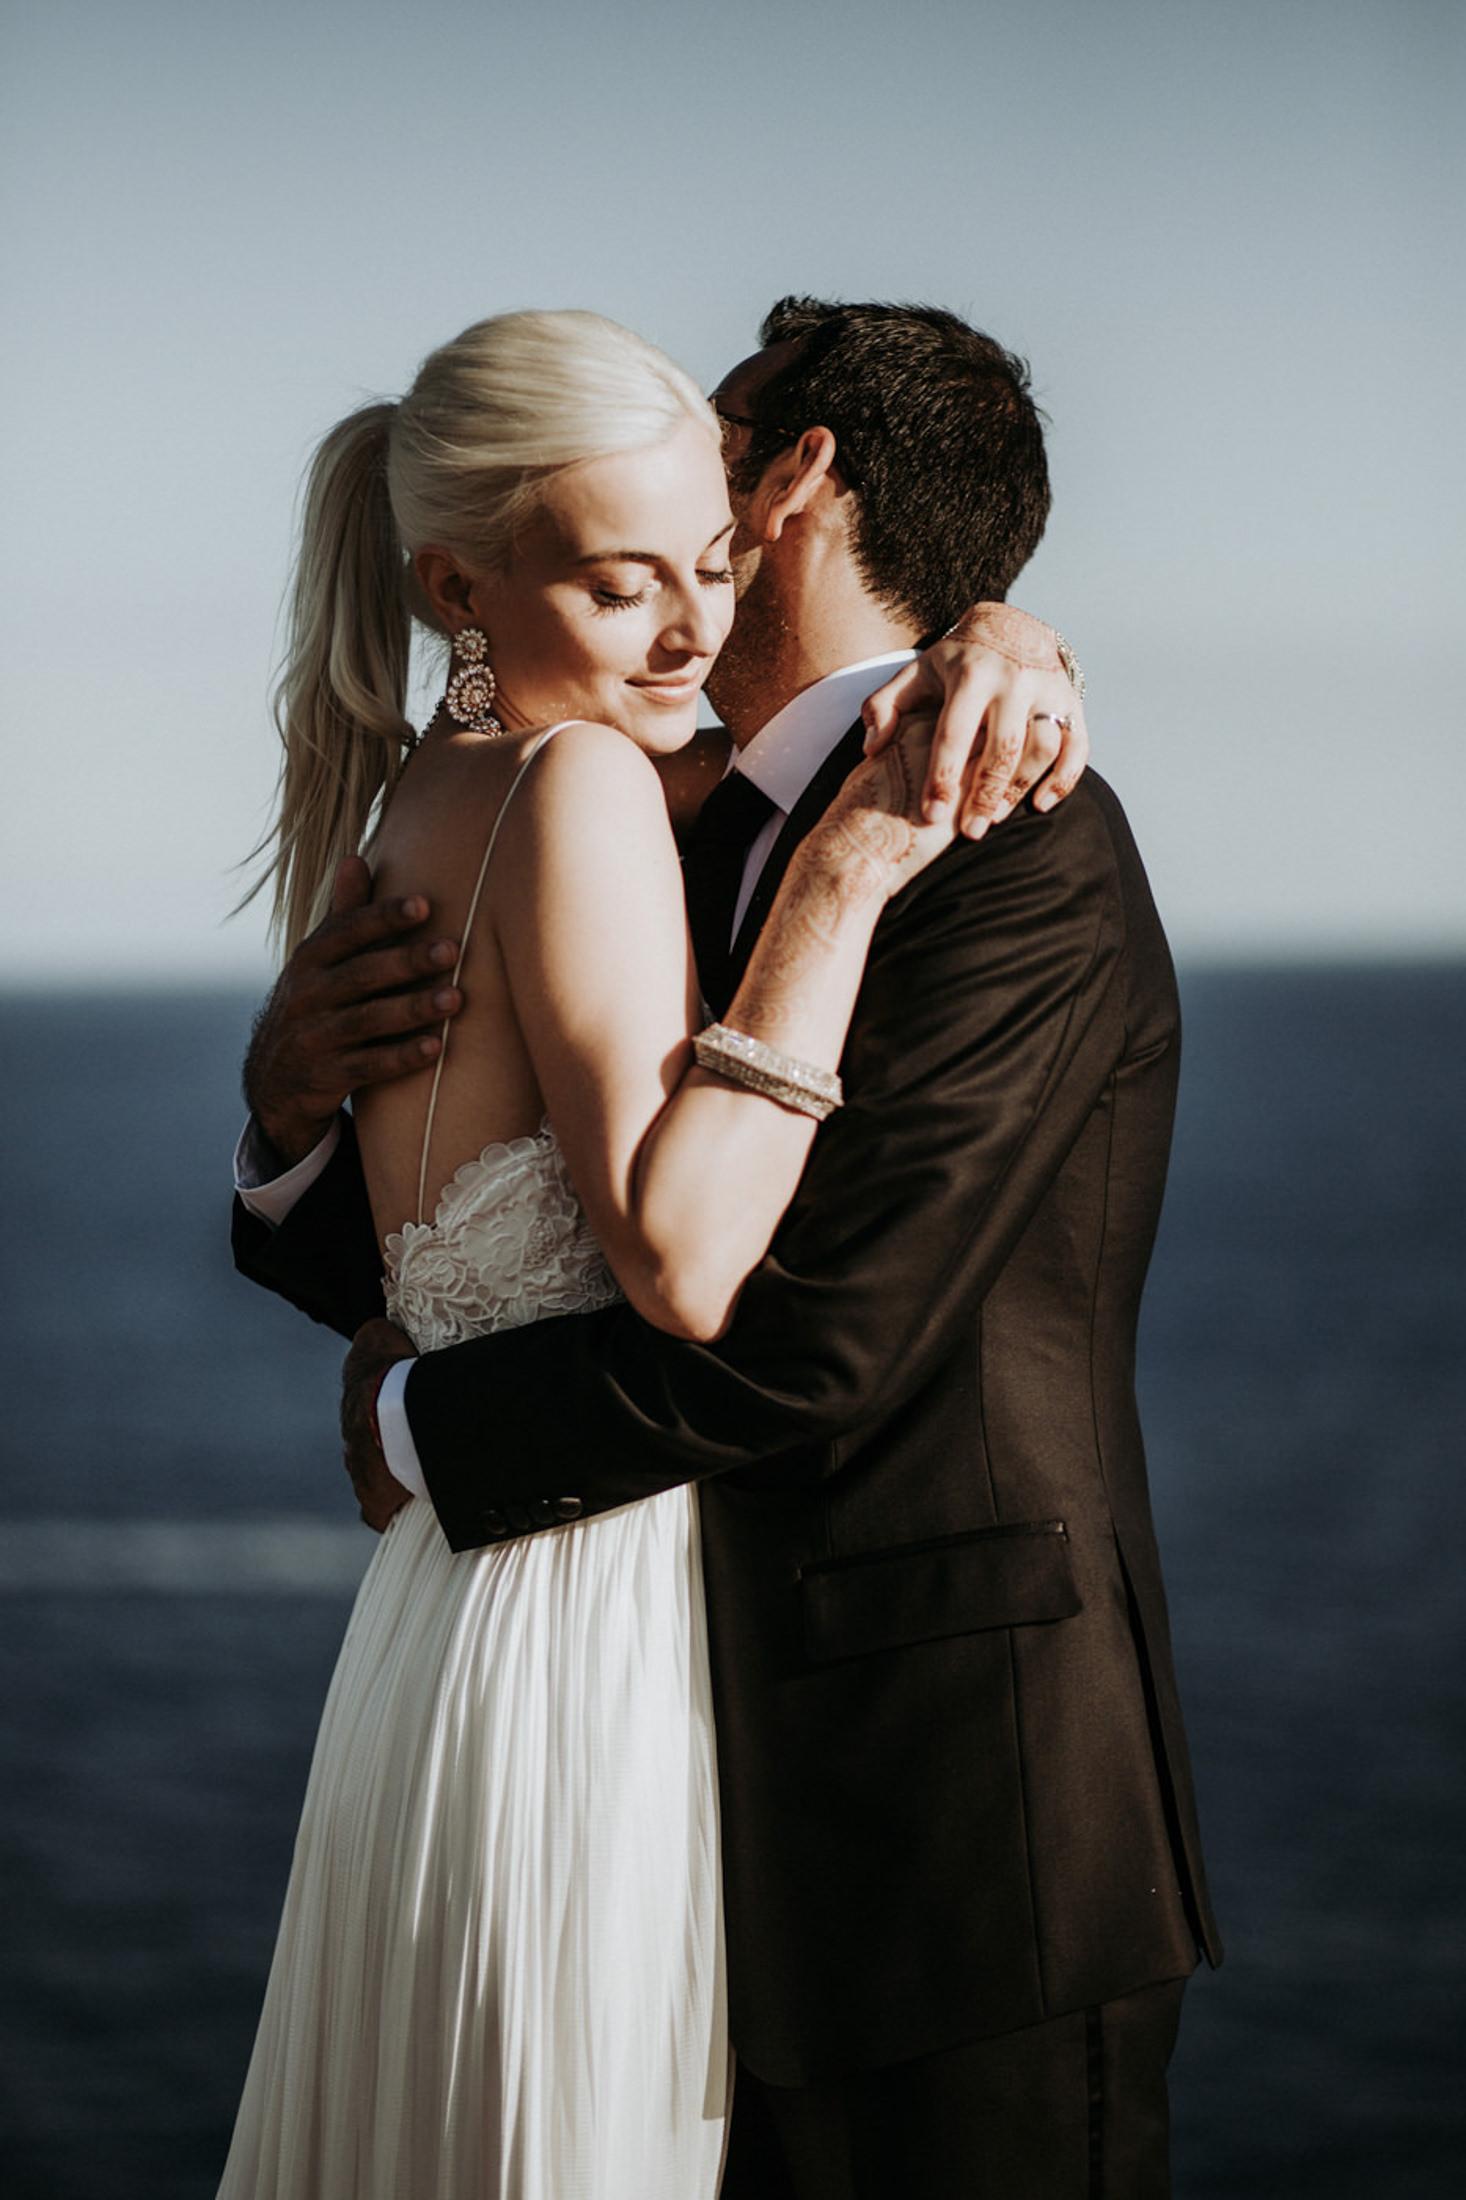 Wedding_Photographer_Mallorca_Daniela-Marquardt_Photography_New_York_Iceland_Tuscany_Santorini_Portugal_Austria_Bavaria_Elopement_Hochzeitsfotograf_AntjeRajat2_92